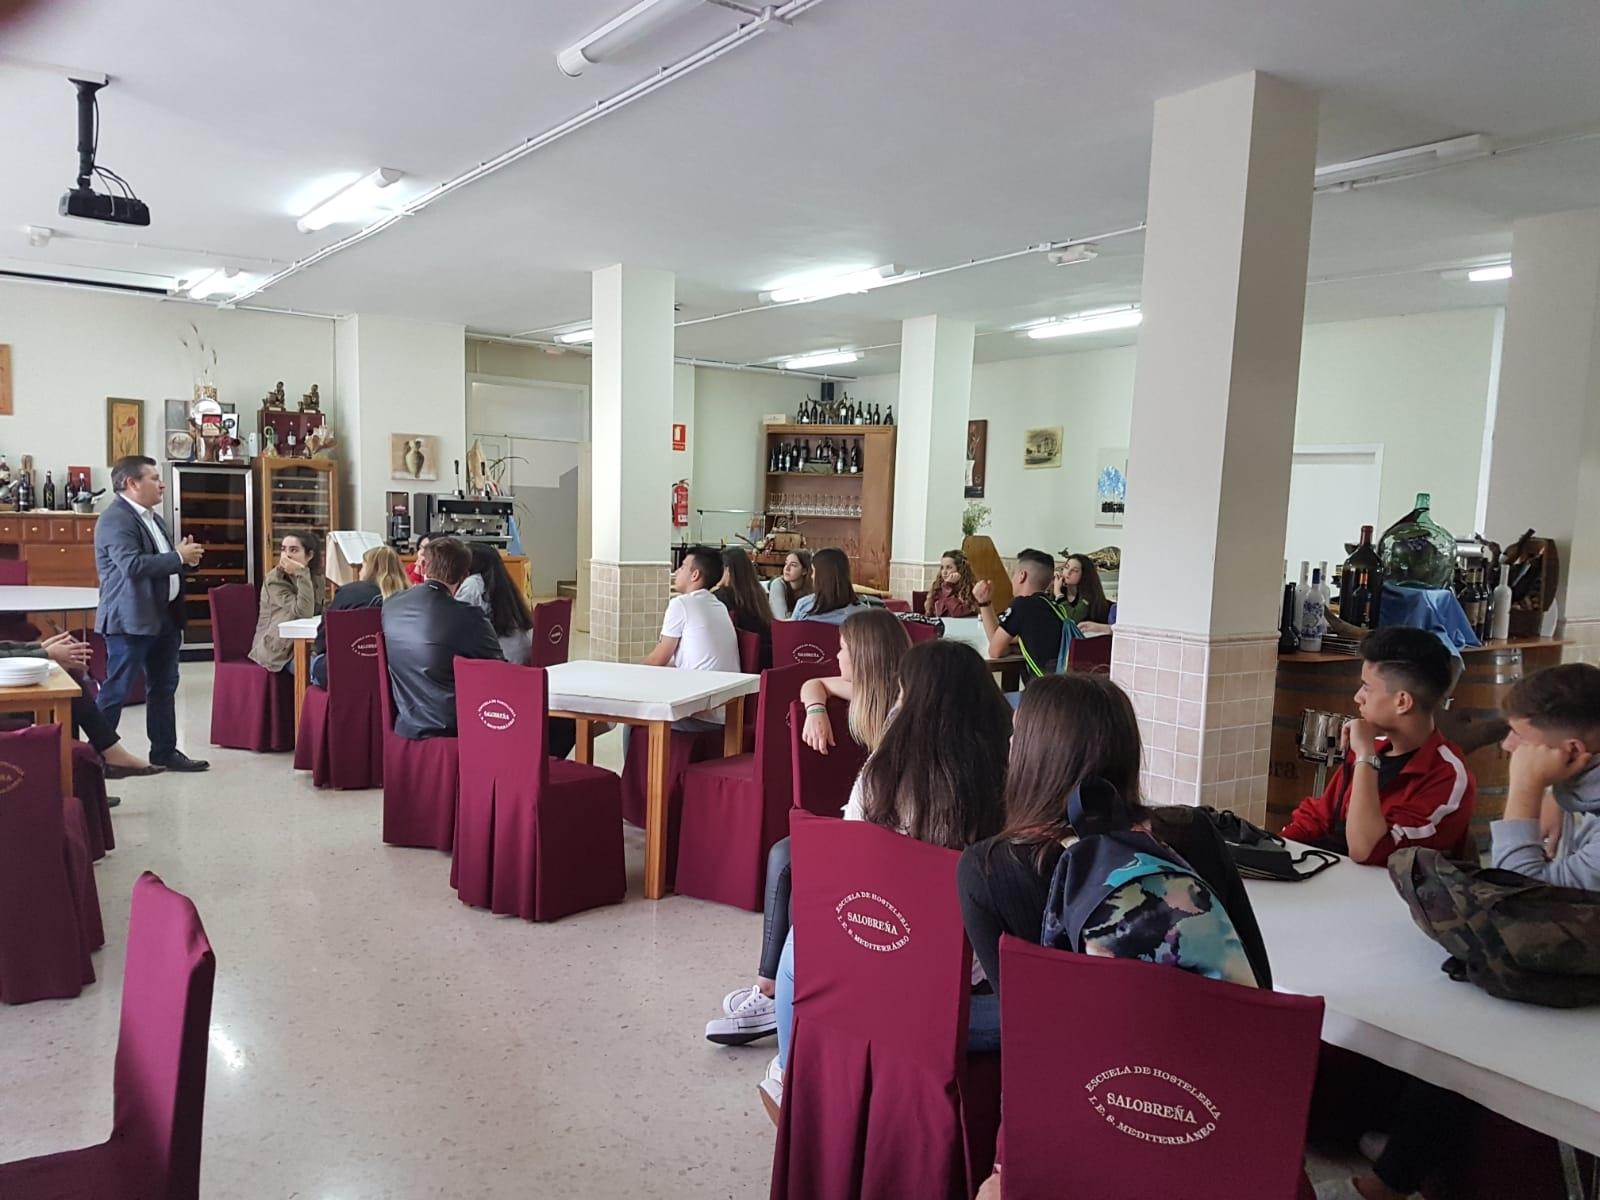 visita-CF-Motril-Salobreña-2019-16